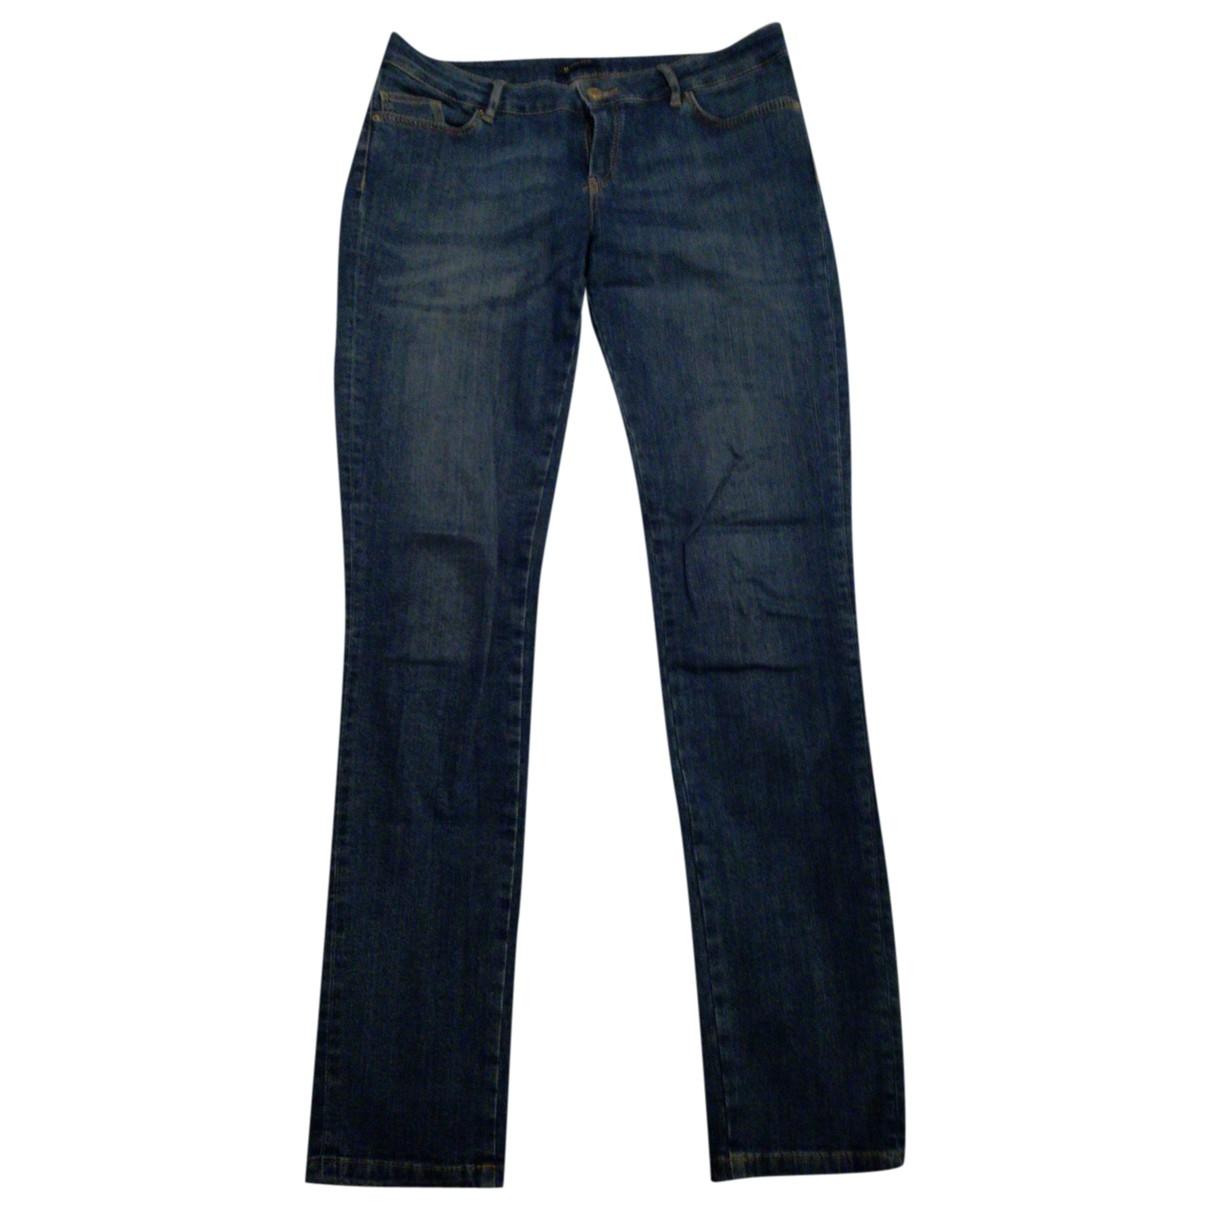 Massimo Dutti \N Blue Cotton - elasthane Jeans for Women 32 US